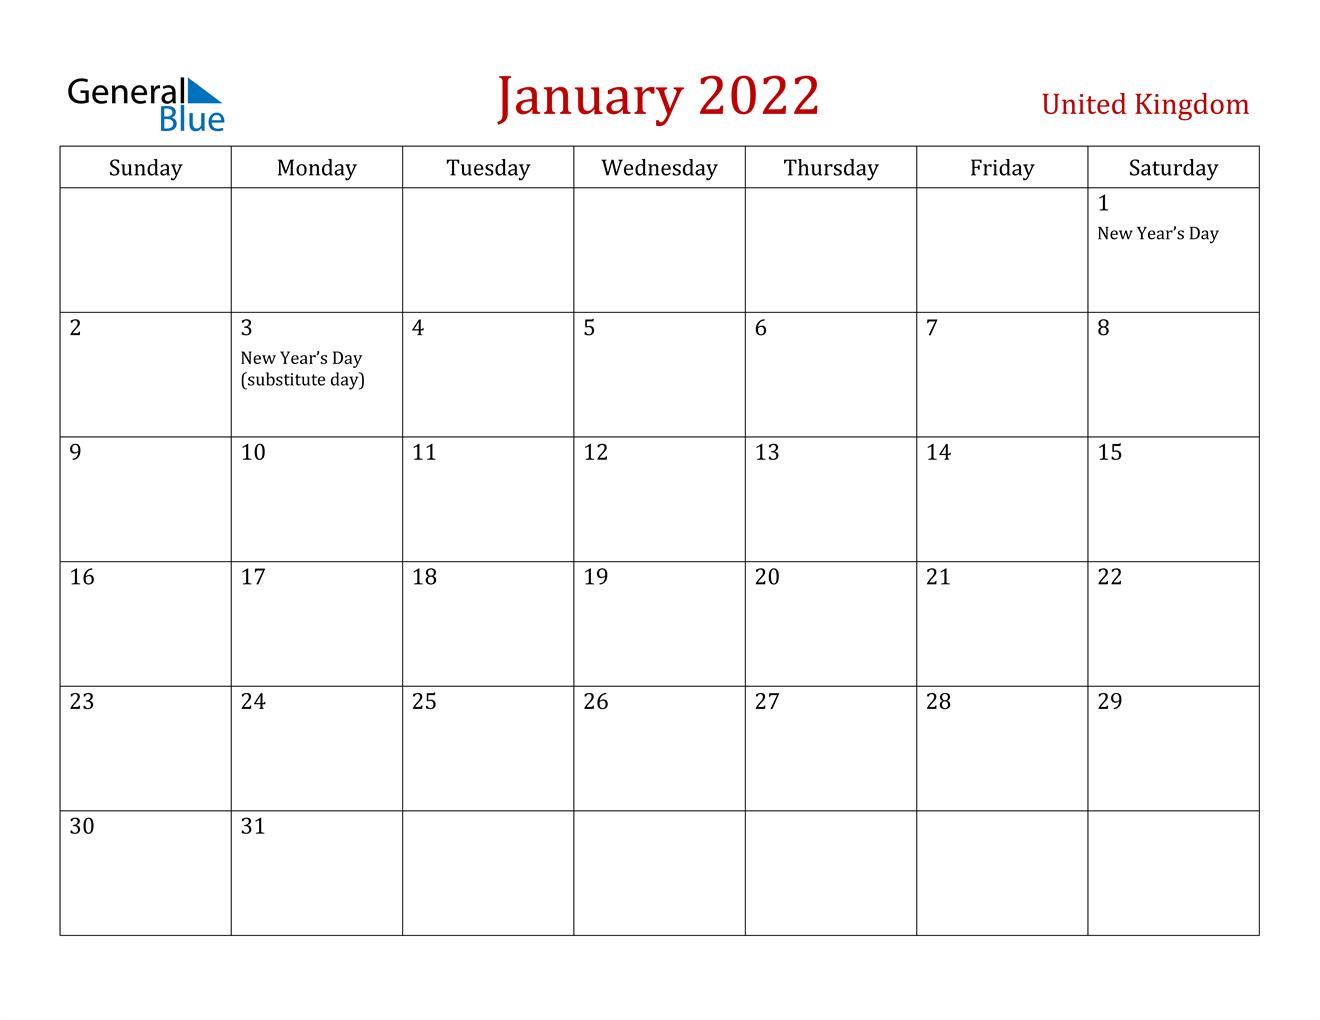 January 2022 Calendar - United Kingdom